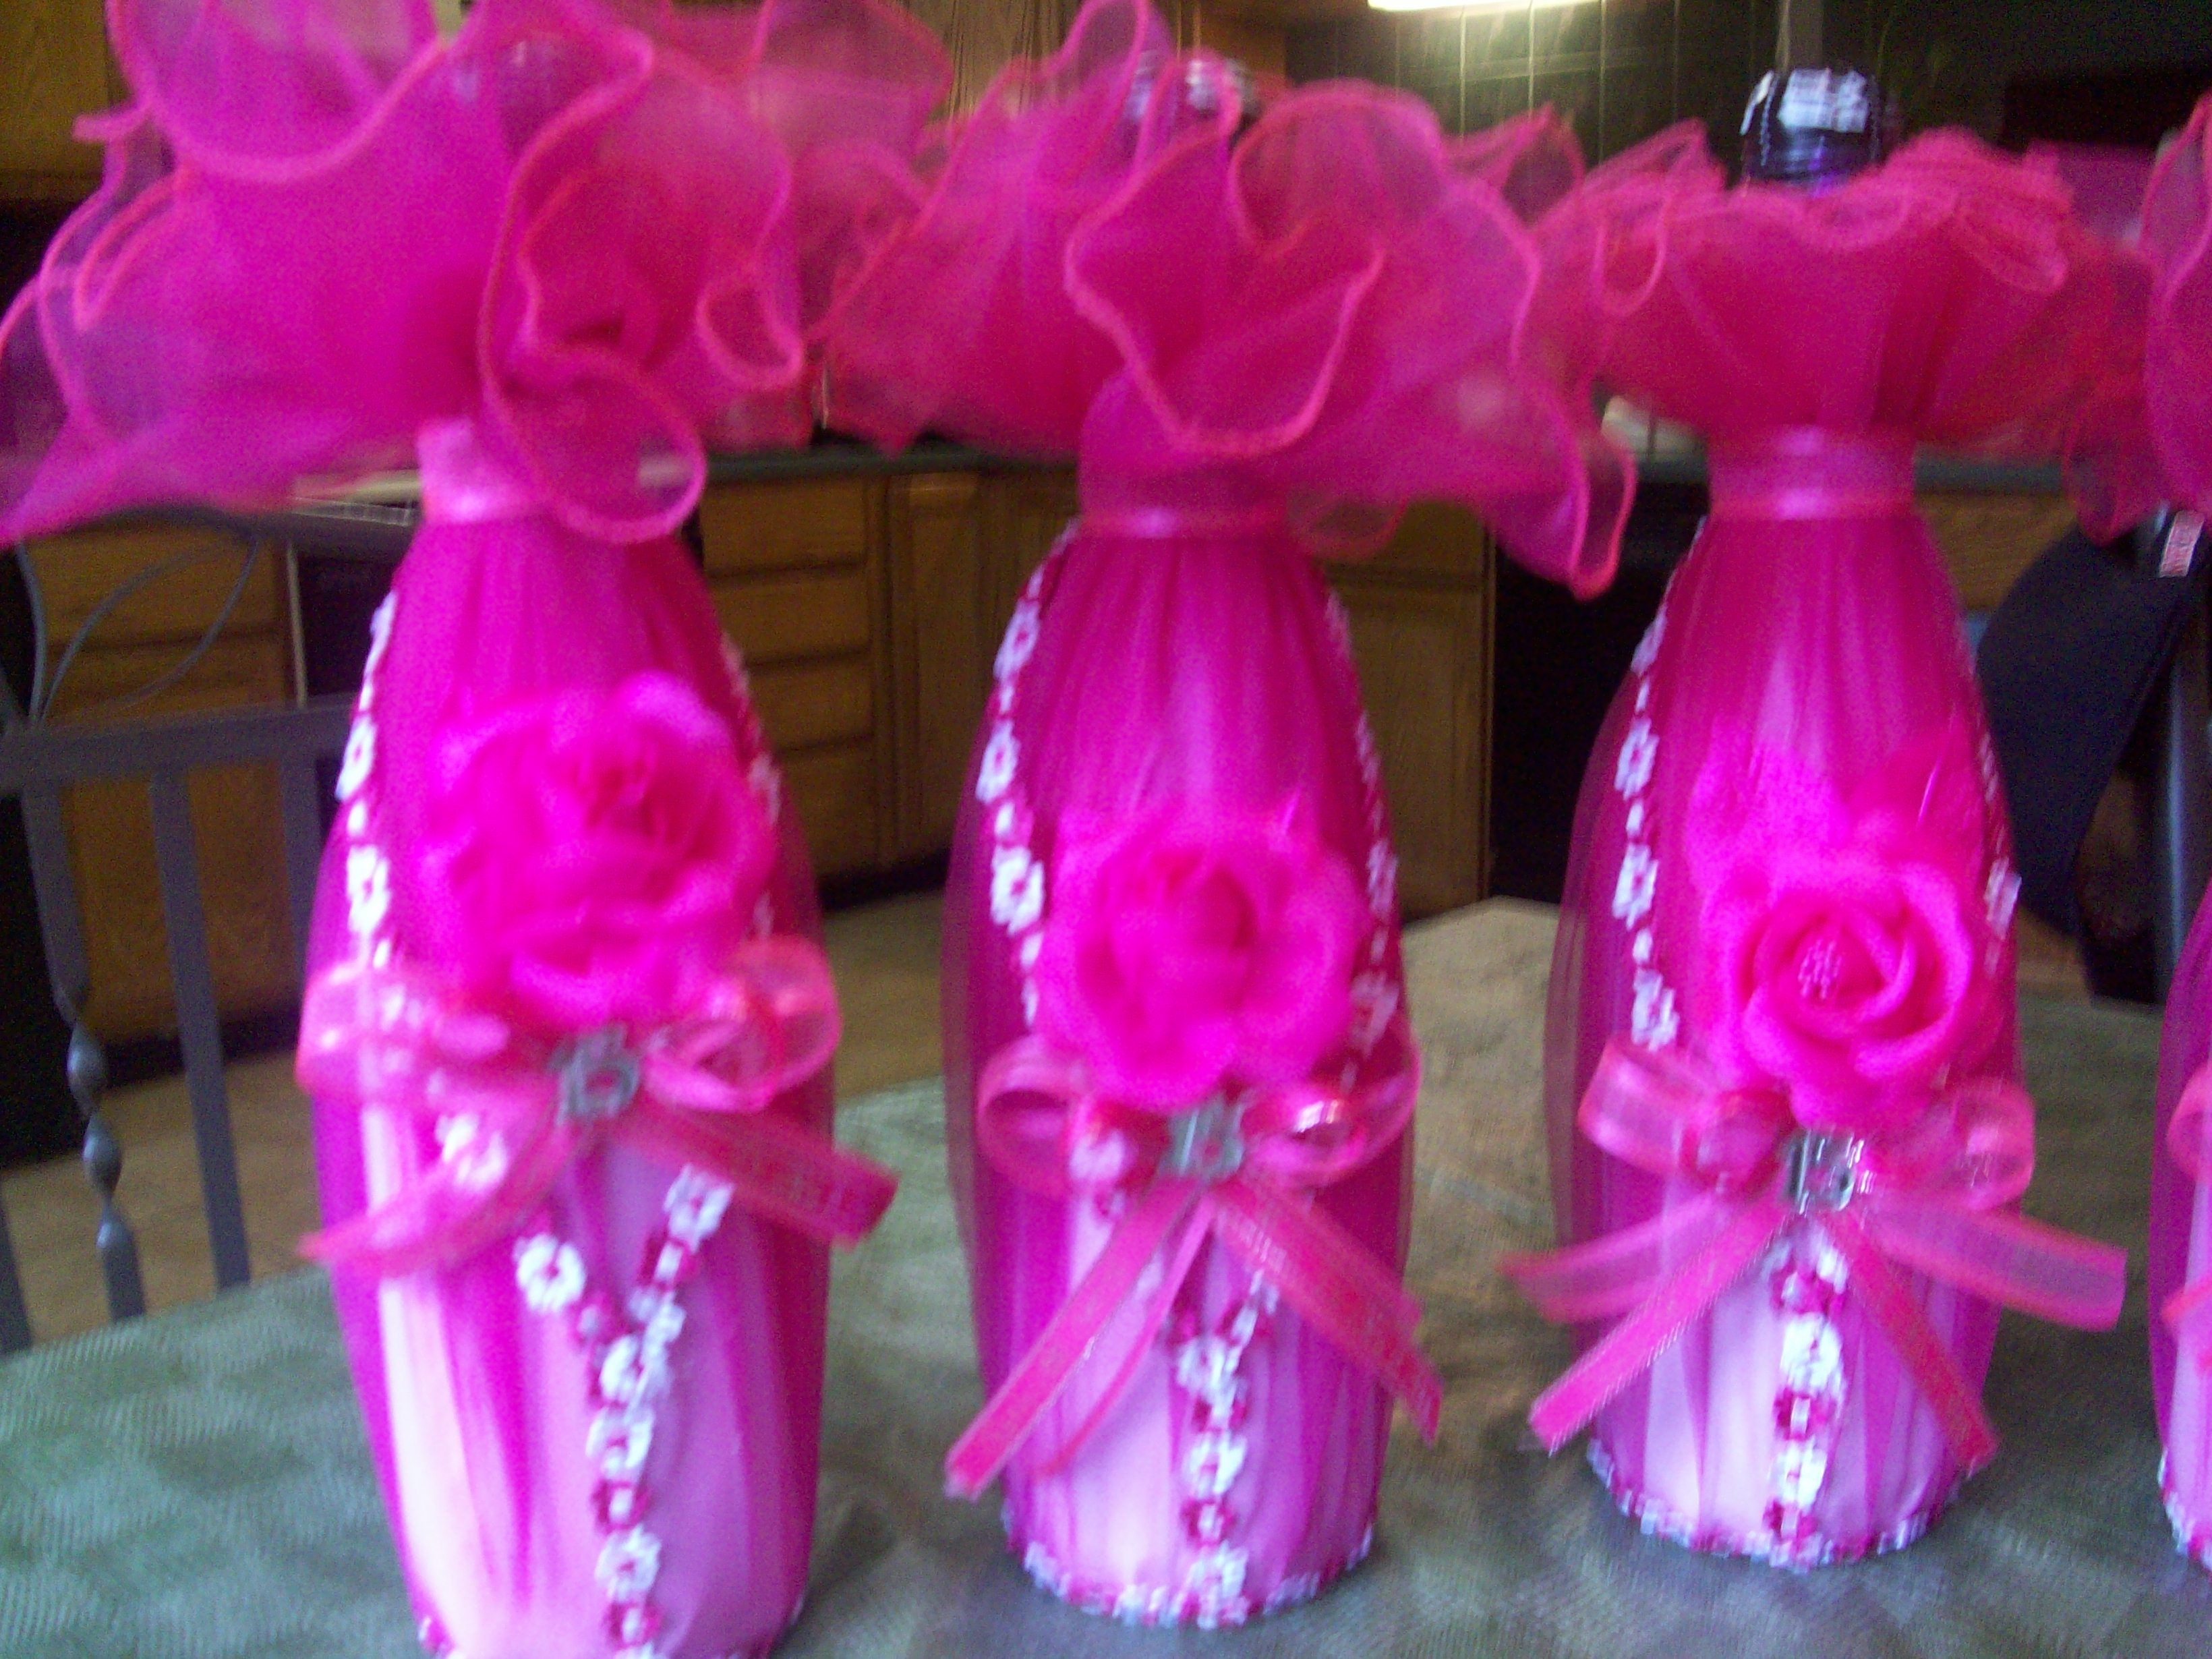 Areglos de xv anos botellas decoradas 15 anos for Mesas decoradas para 15 anos